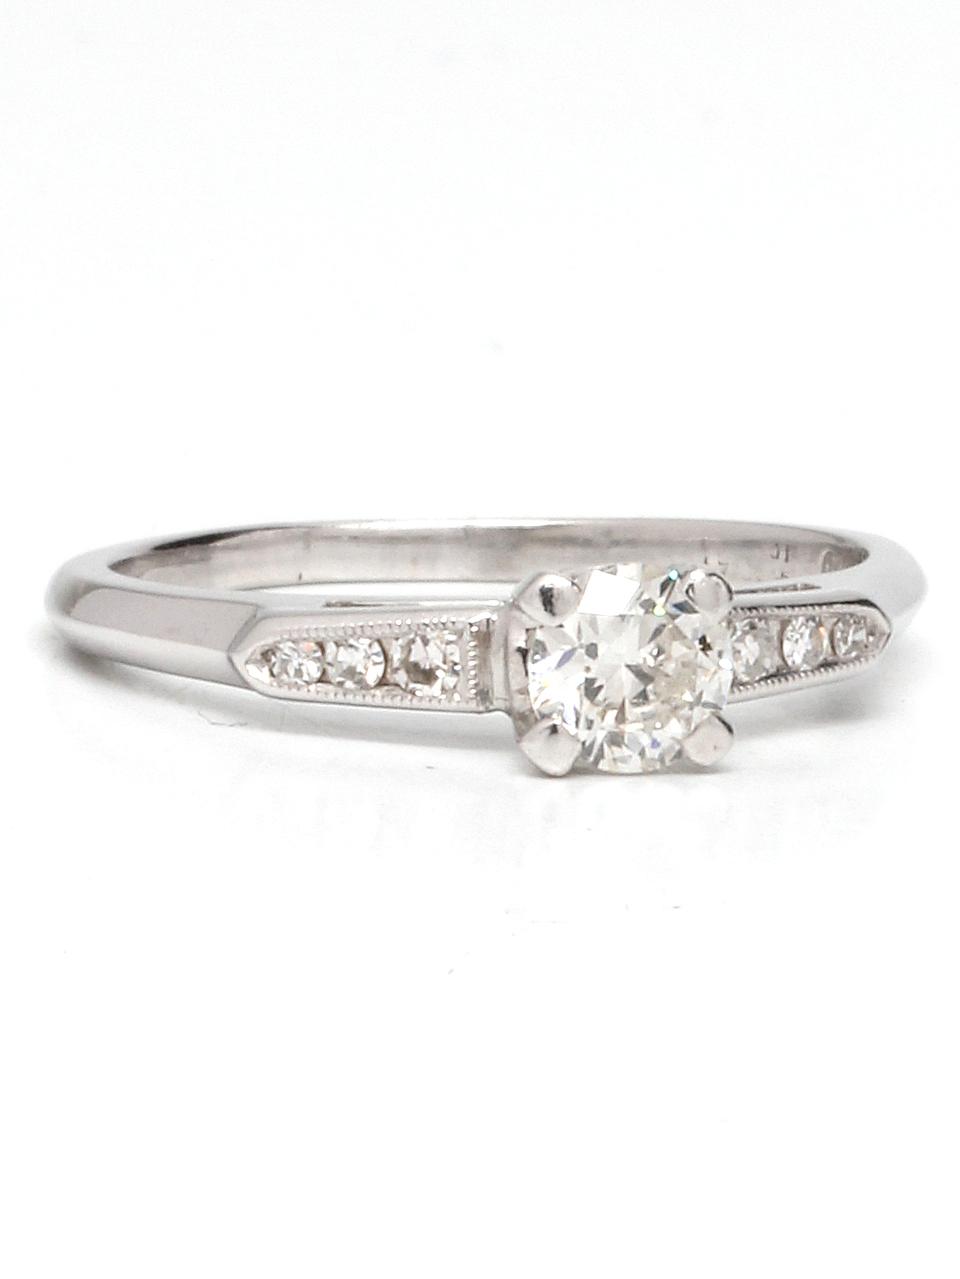 Vintage Platinum Engagement Ring 0.51ct OEC Diamond F-SI1 circa 1930s